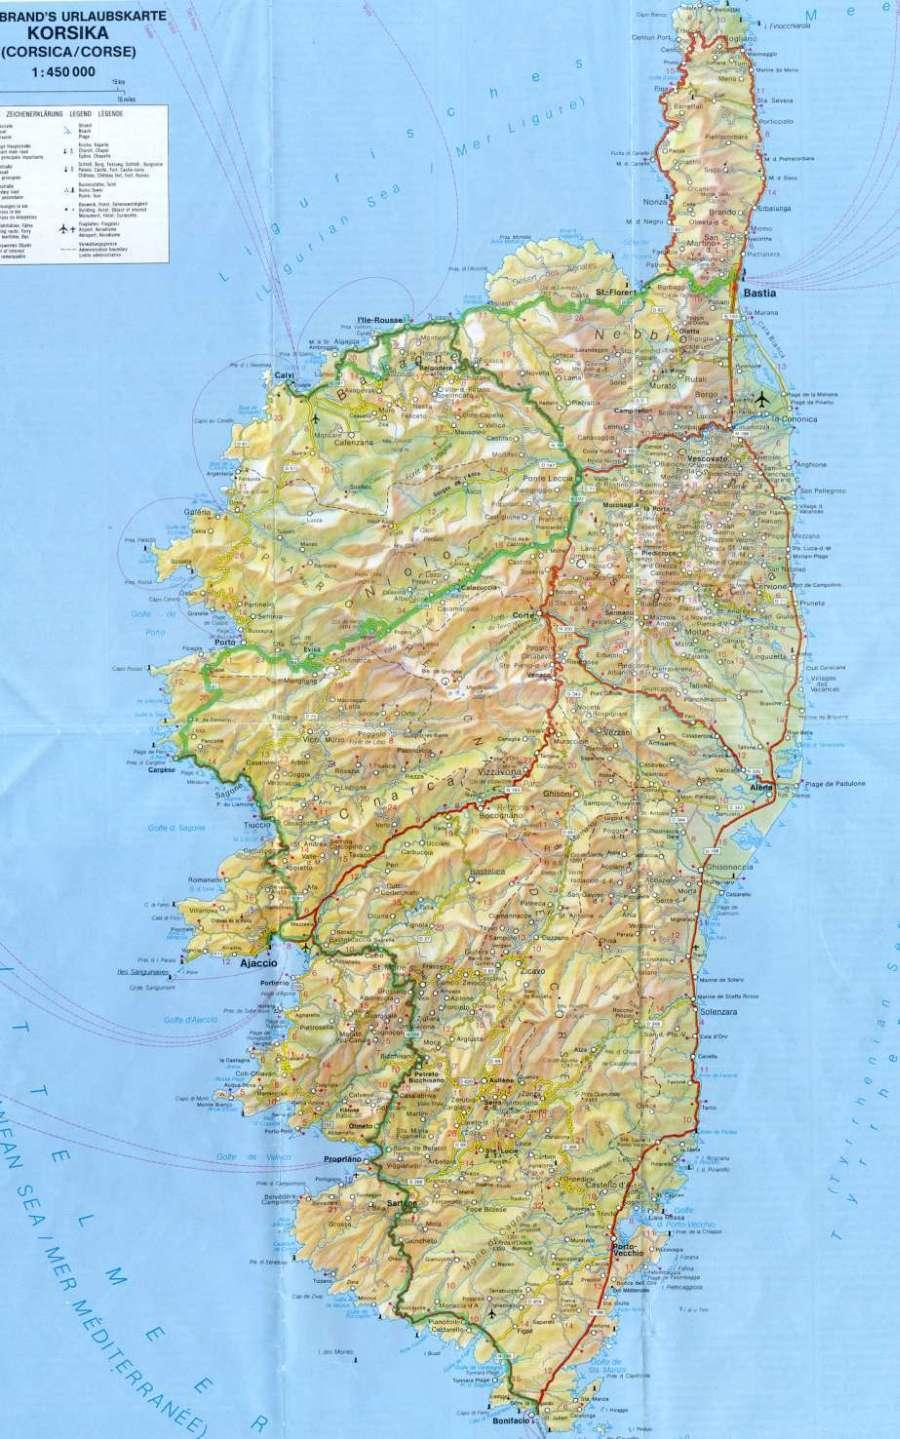 korsika karte Sardinien Korsika Karte Korsika korsika karte